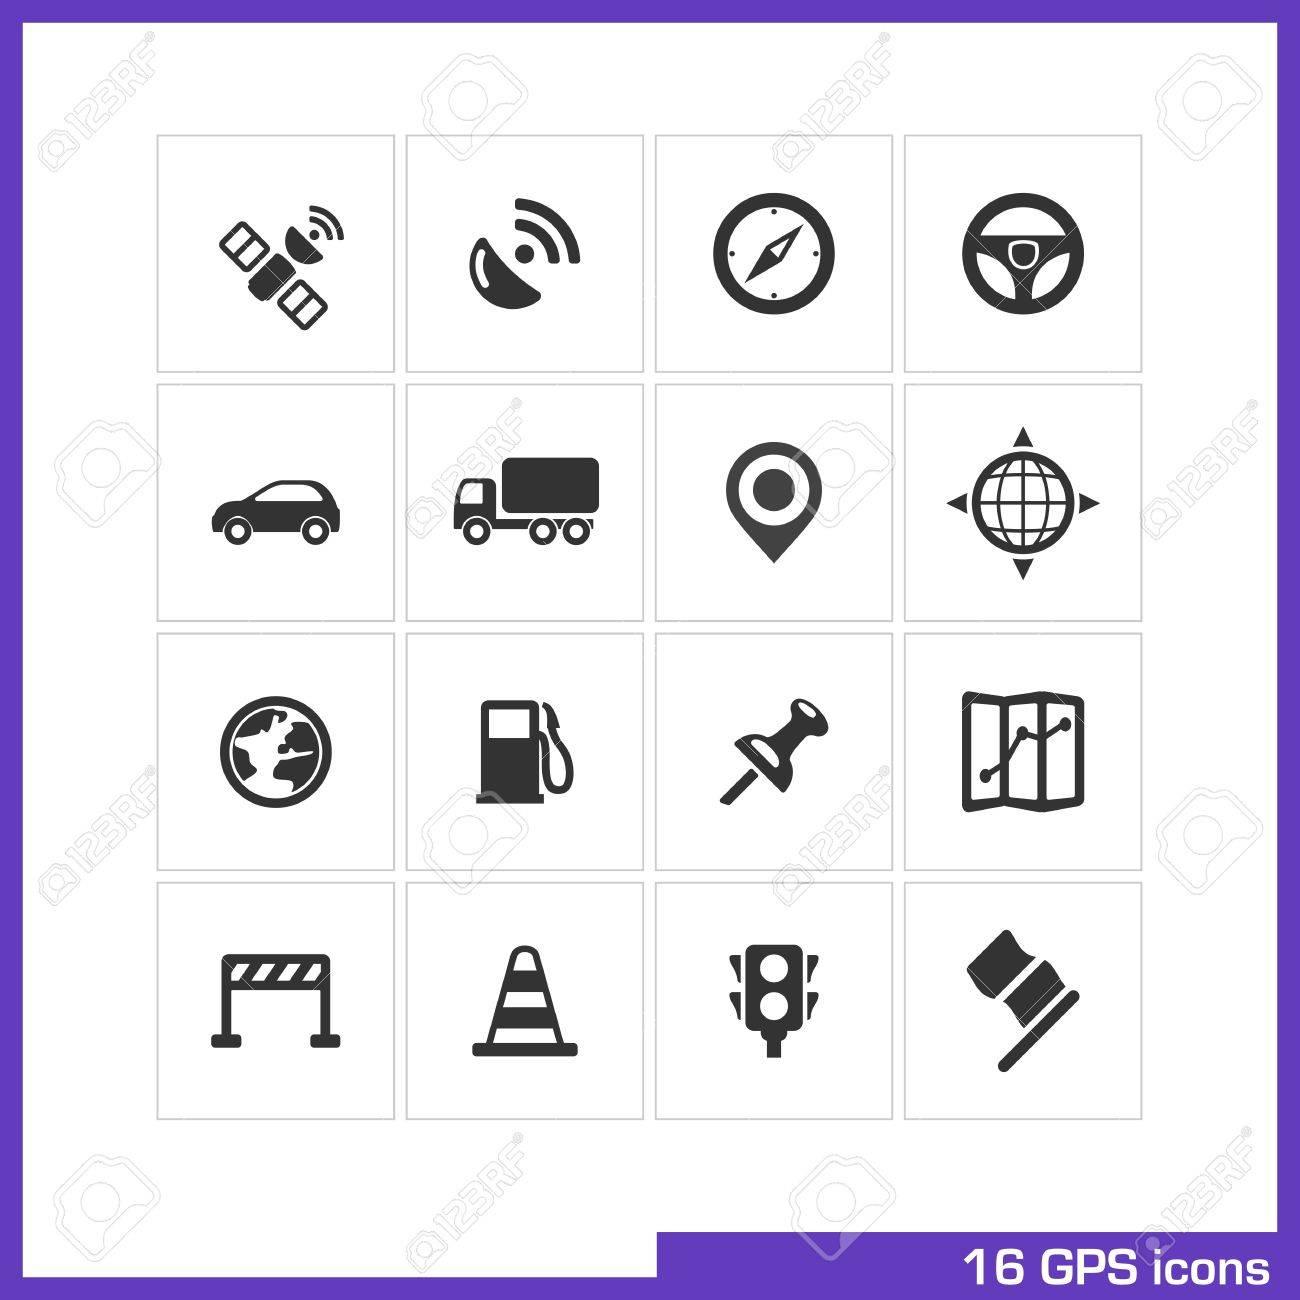 GPS icon set Stock Vector - 19551121